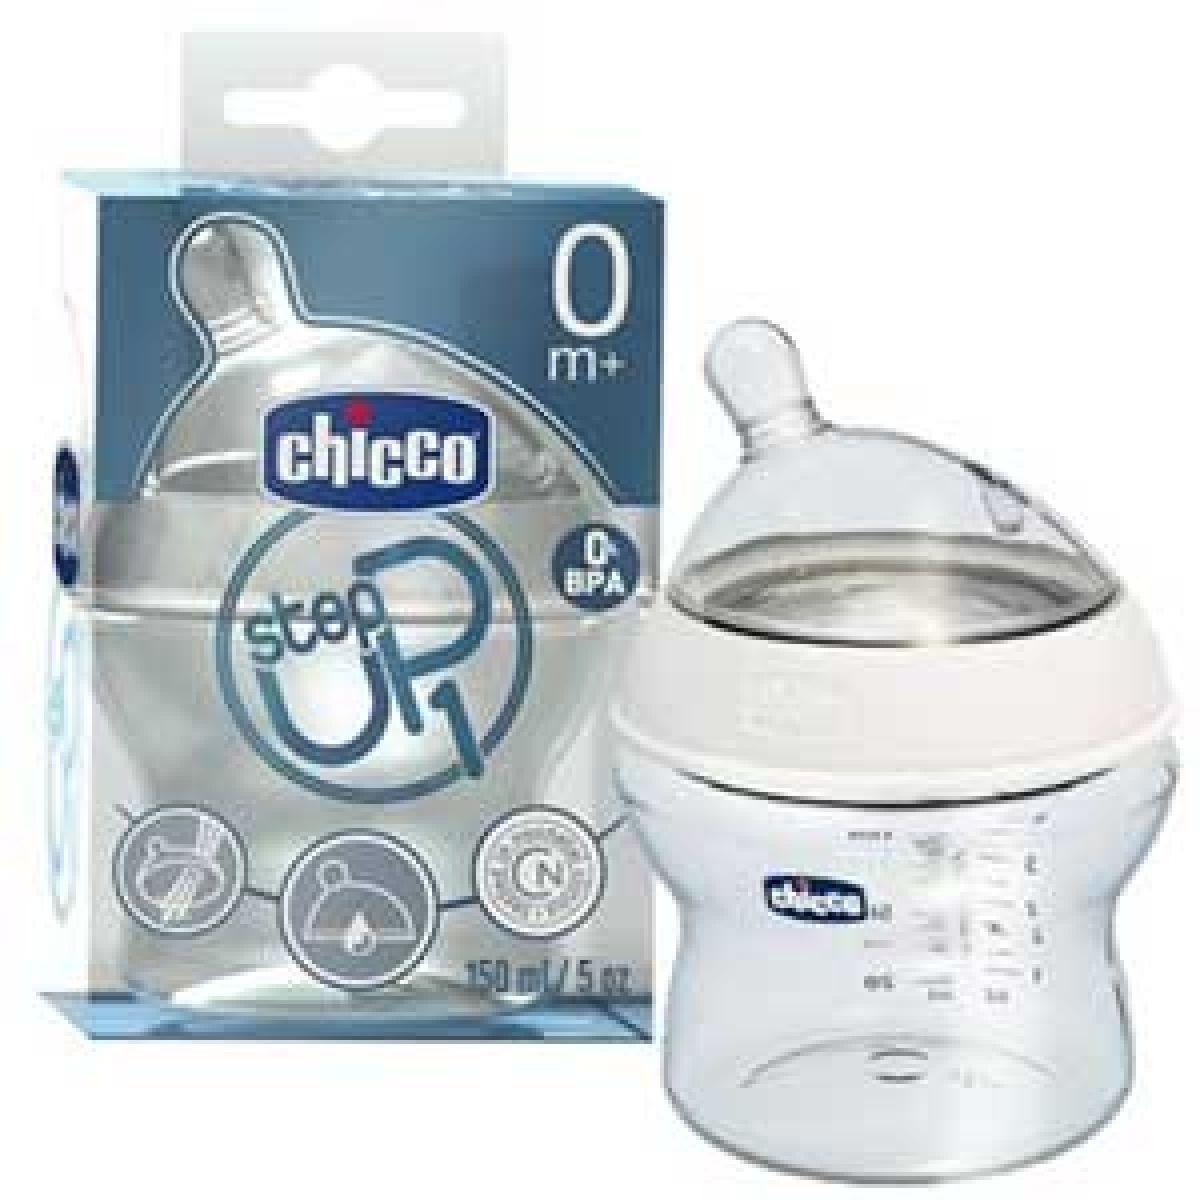 CHICCO 60070 Láhev plast 150 ml, silik.d., 0+